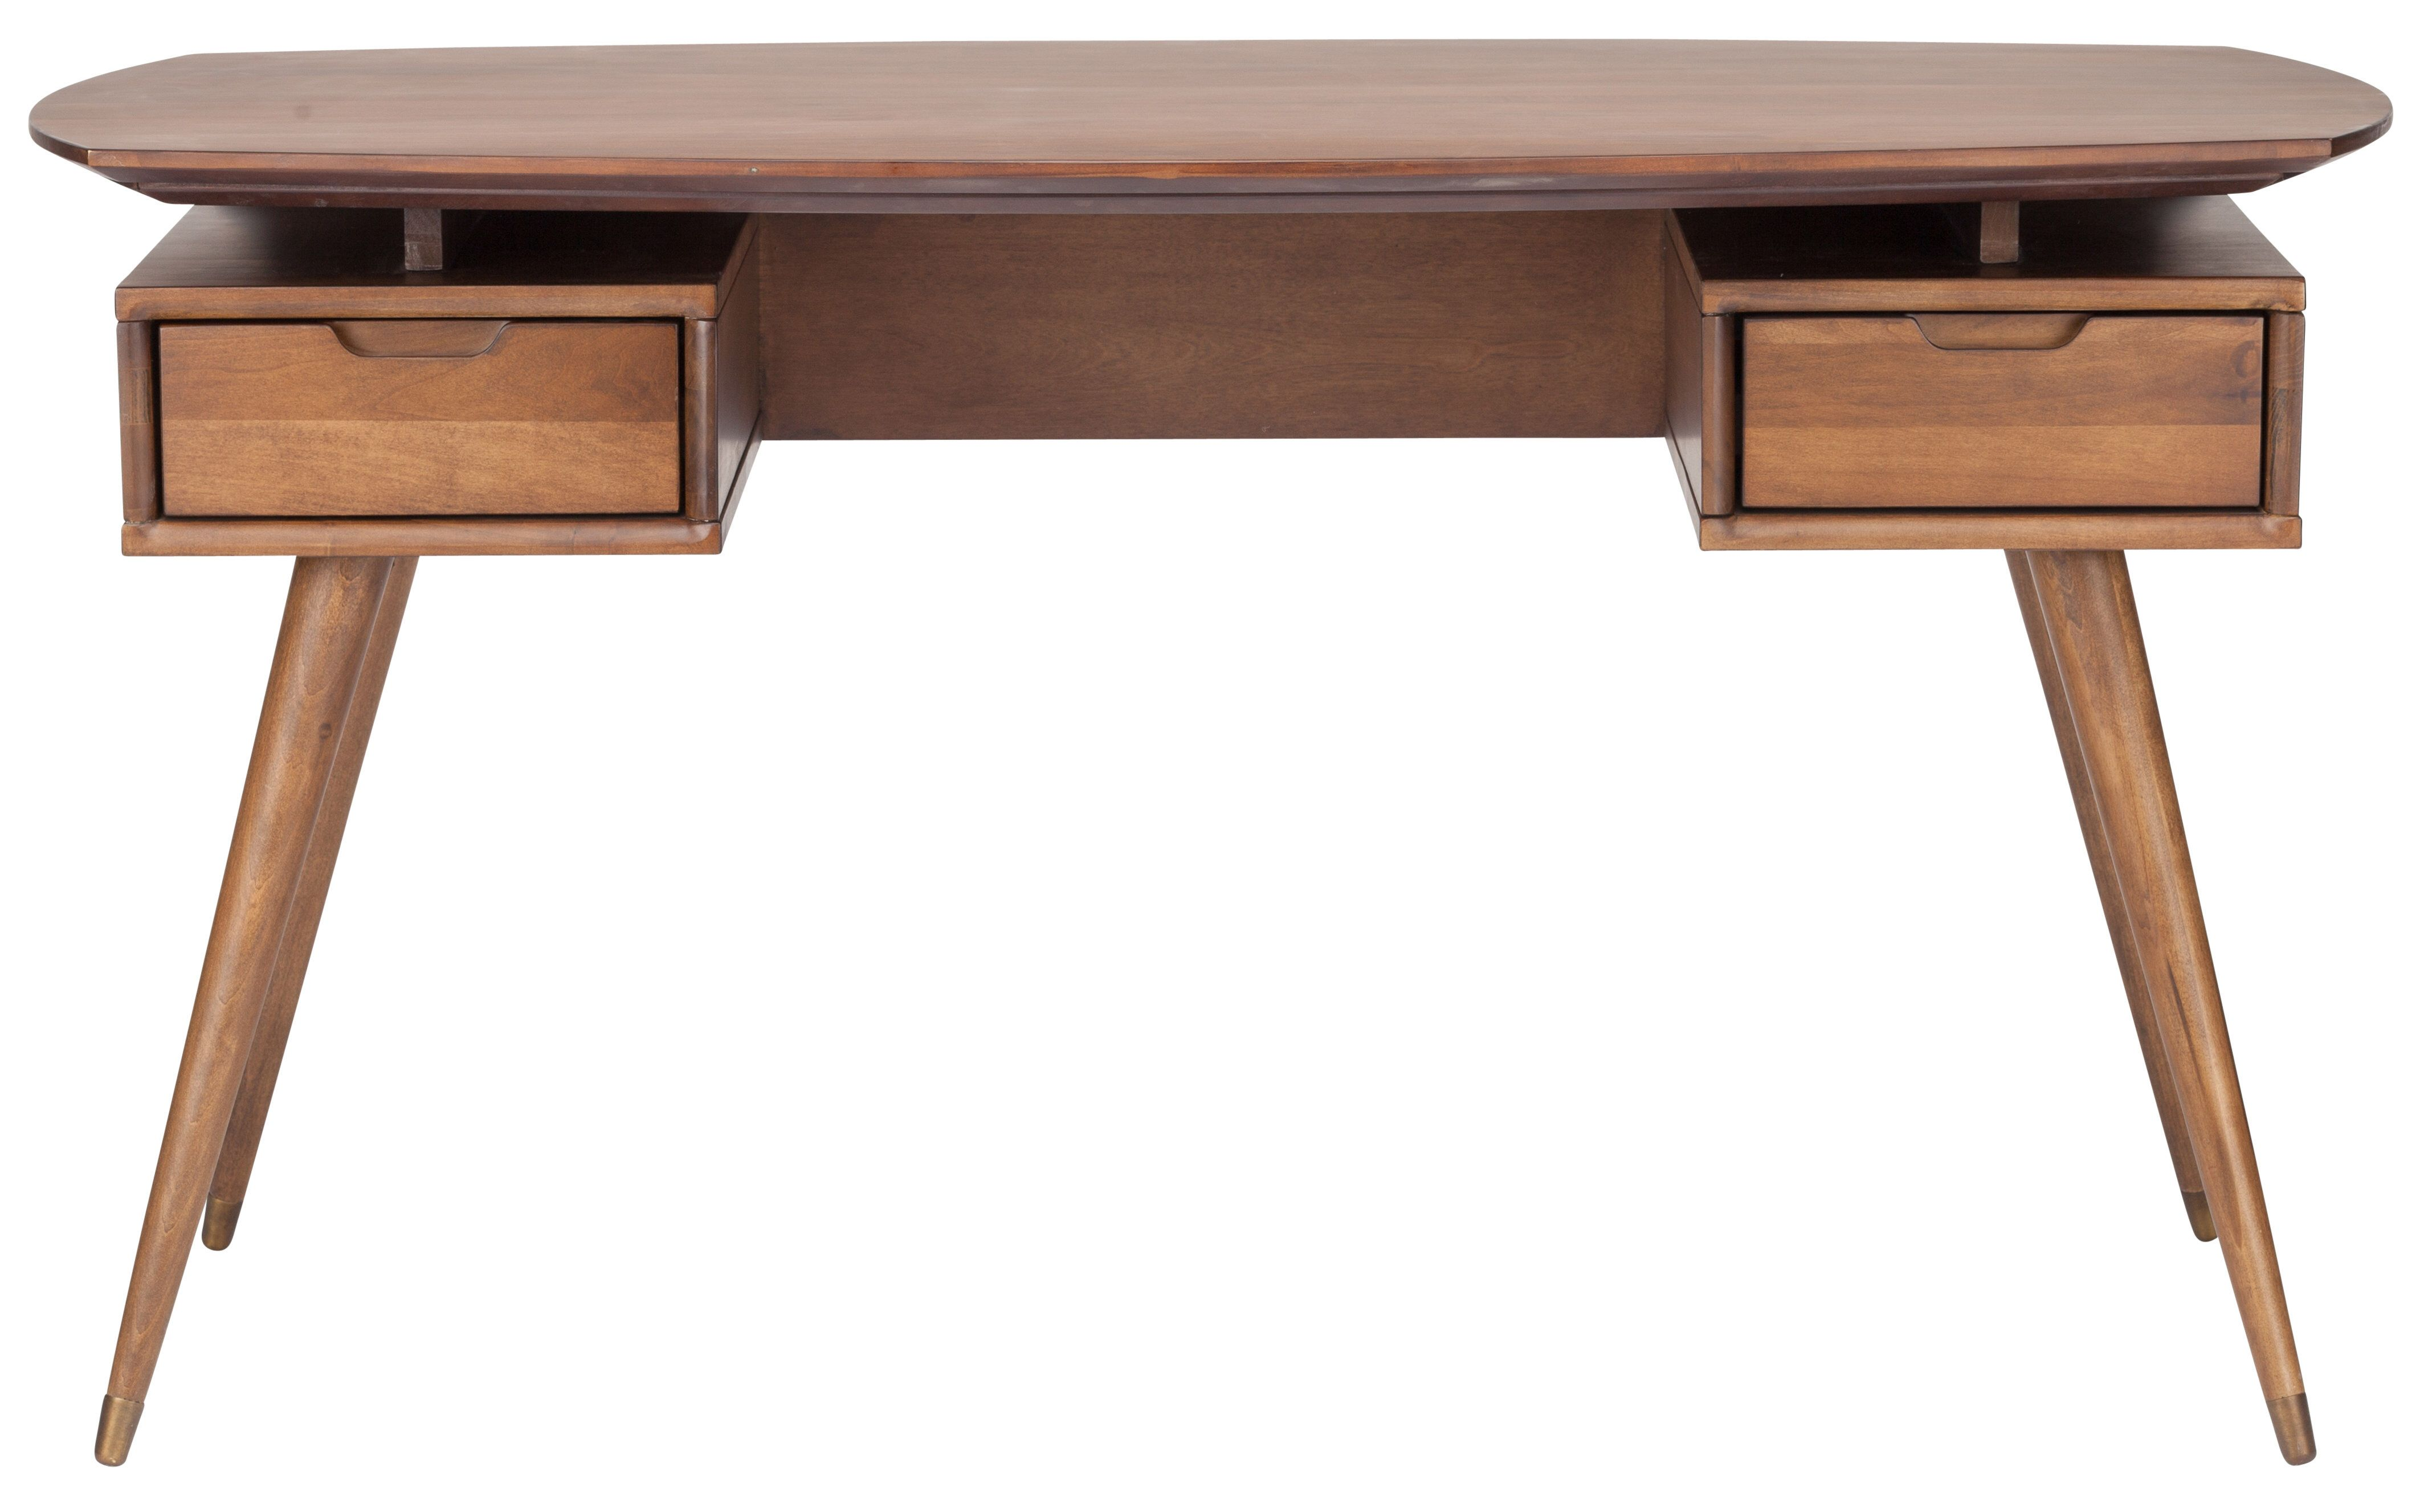 Nuevo Solid Wood Writing Desk Wood writing desk, Wood